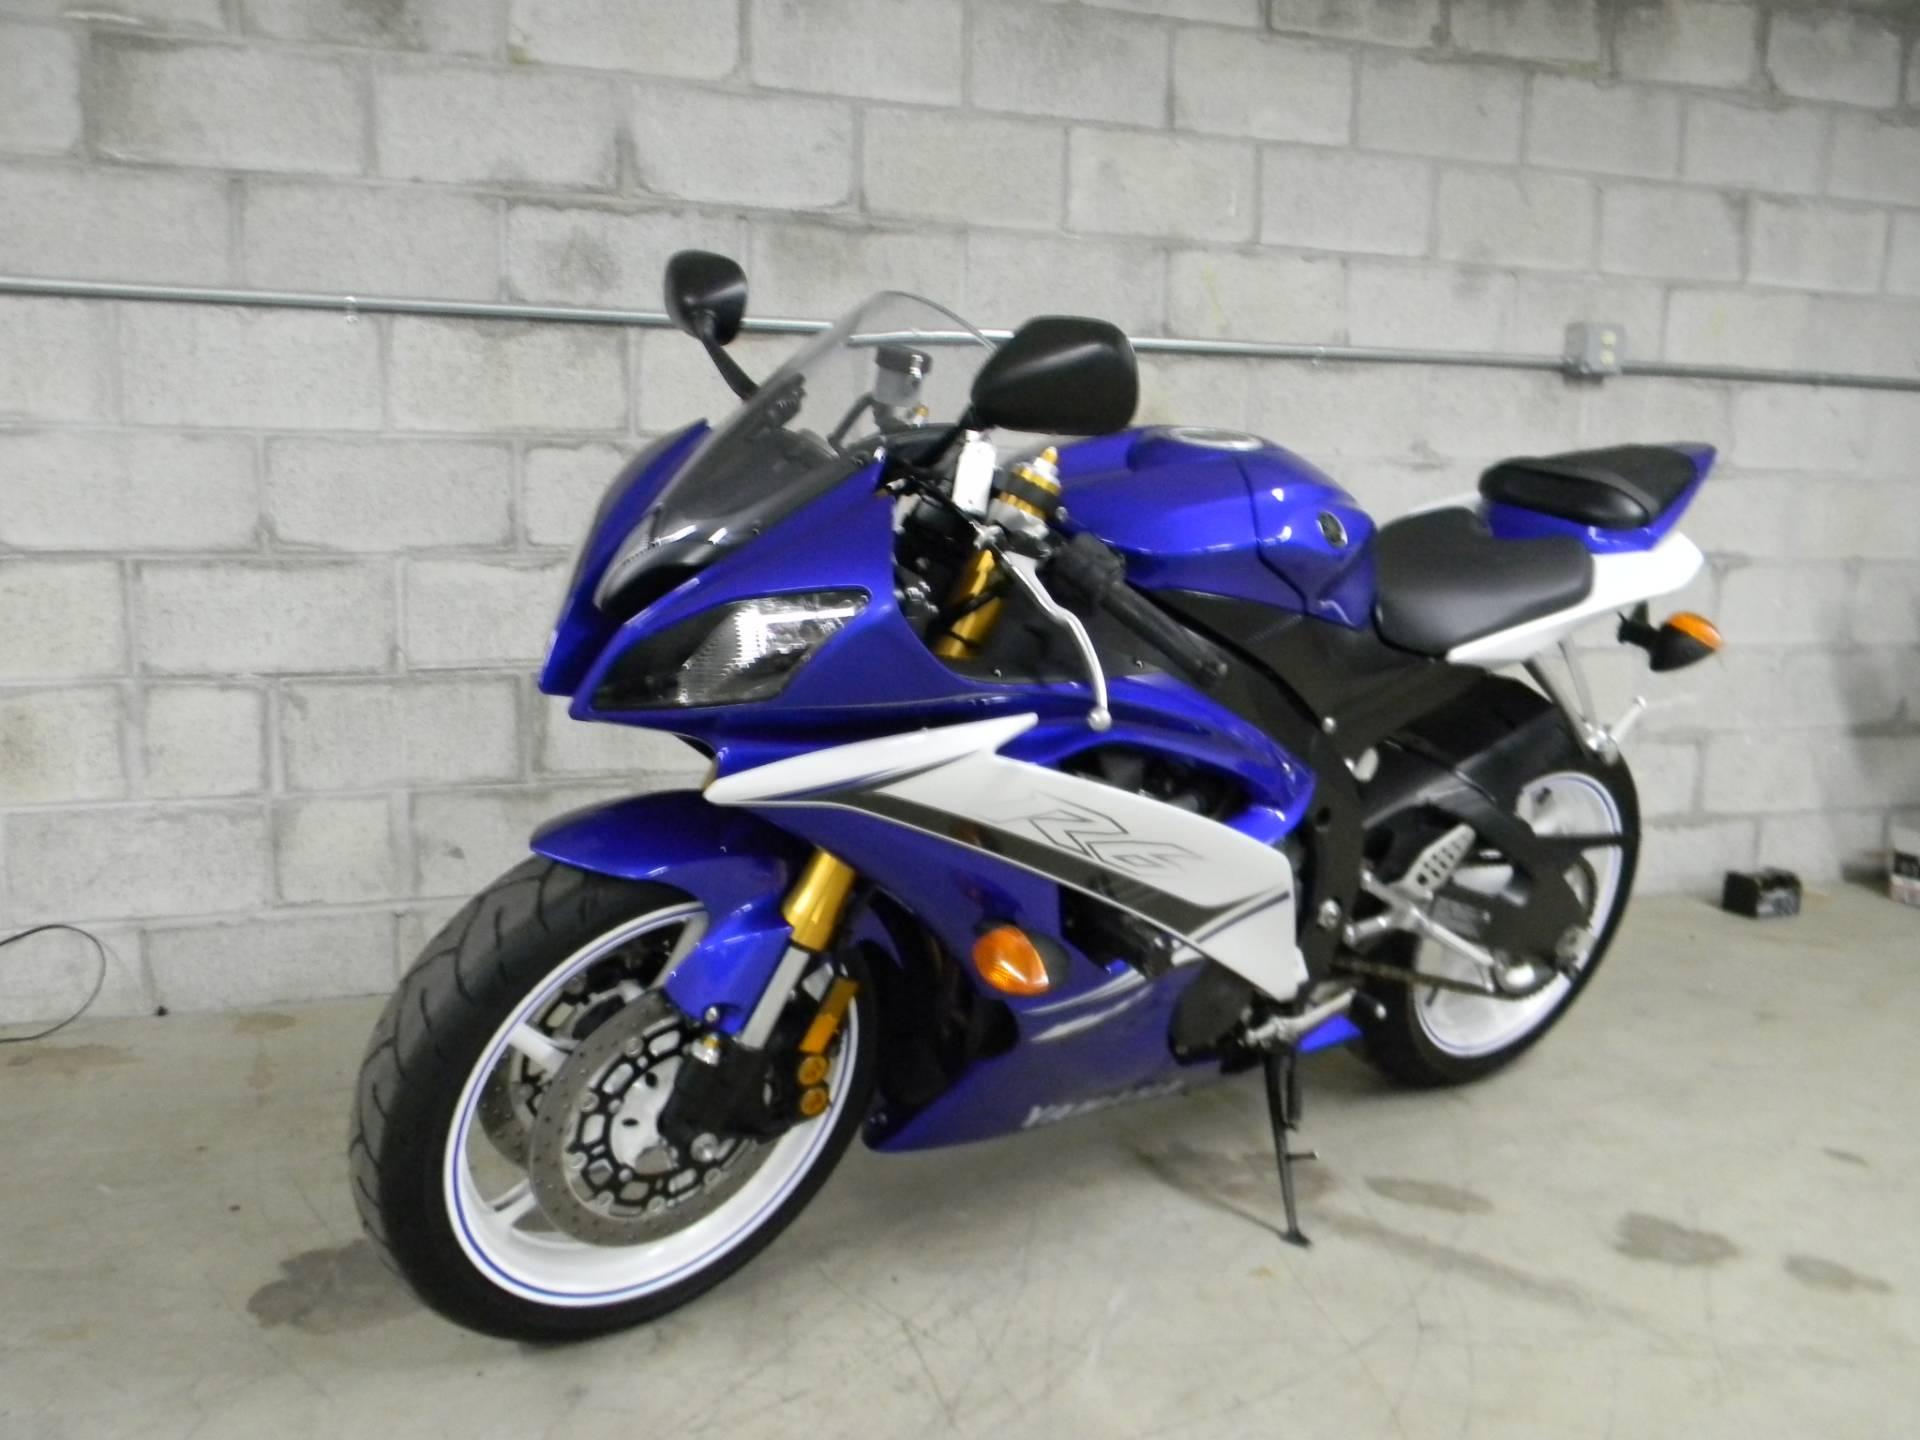 2011 Yamaha YZF-R6 4